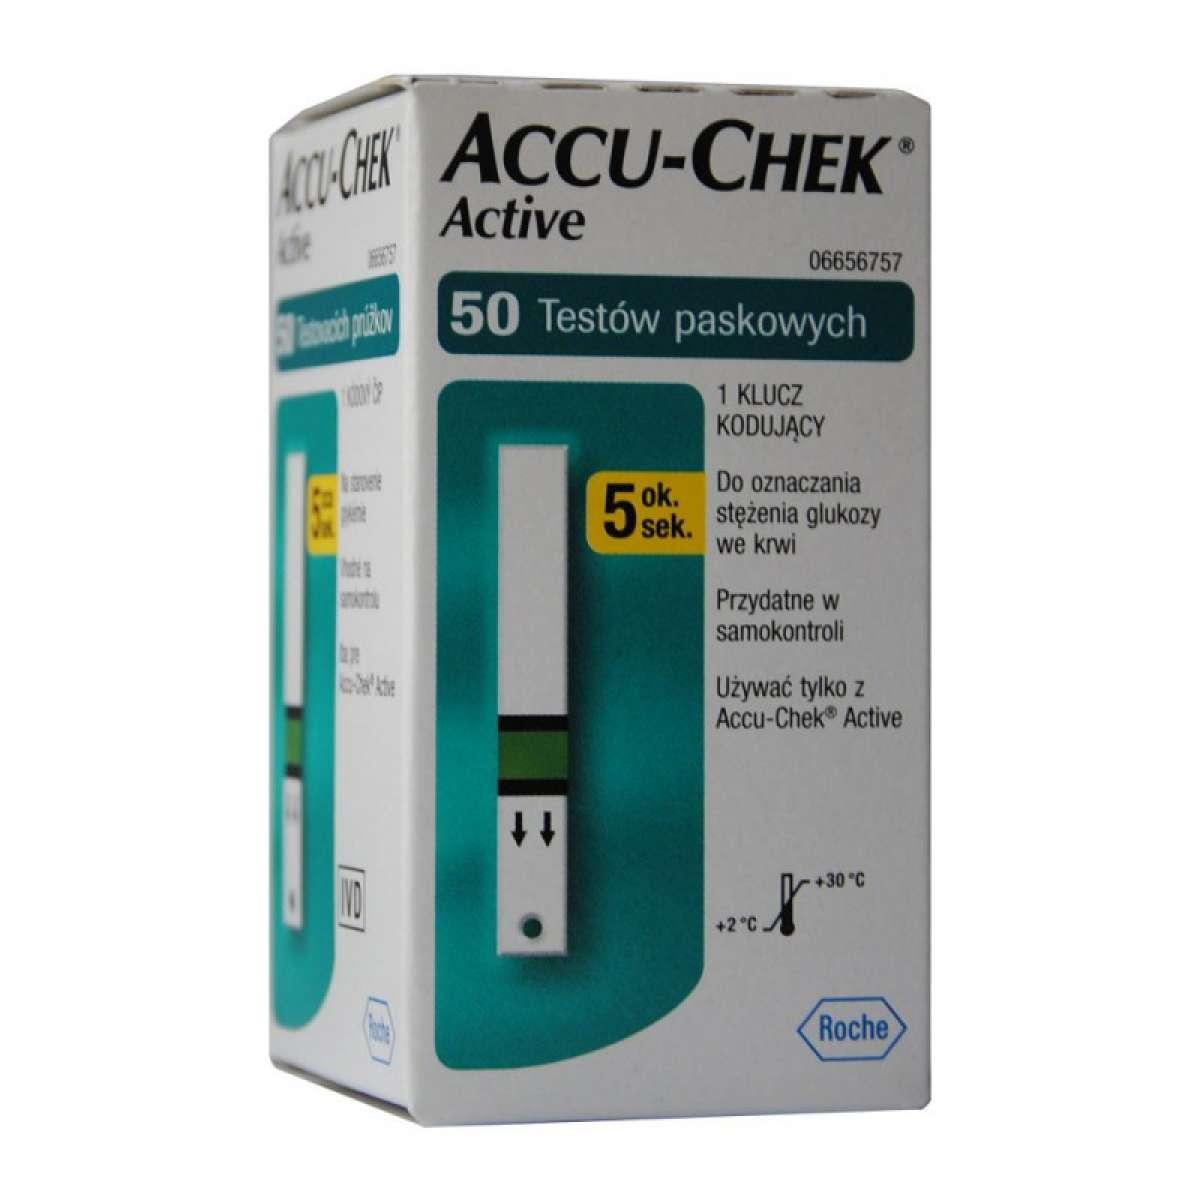 Accu Chek Active 50